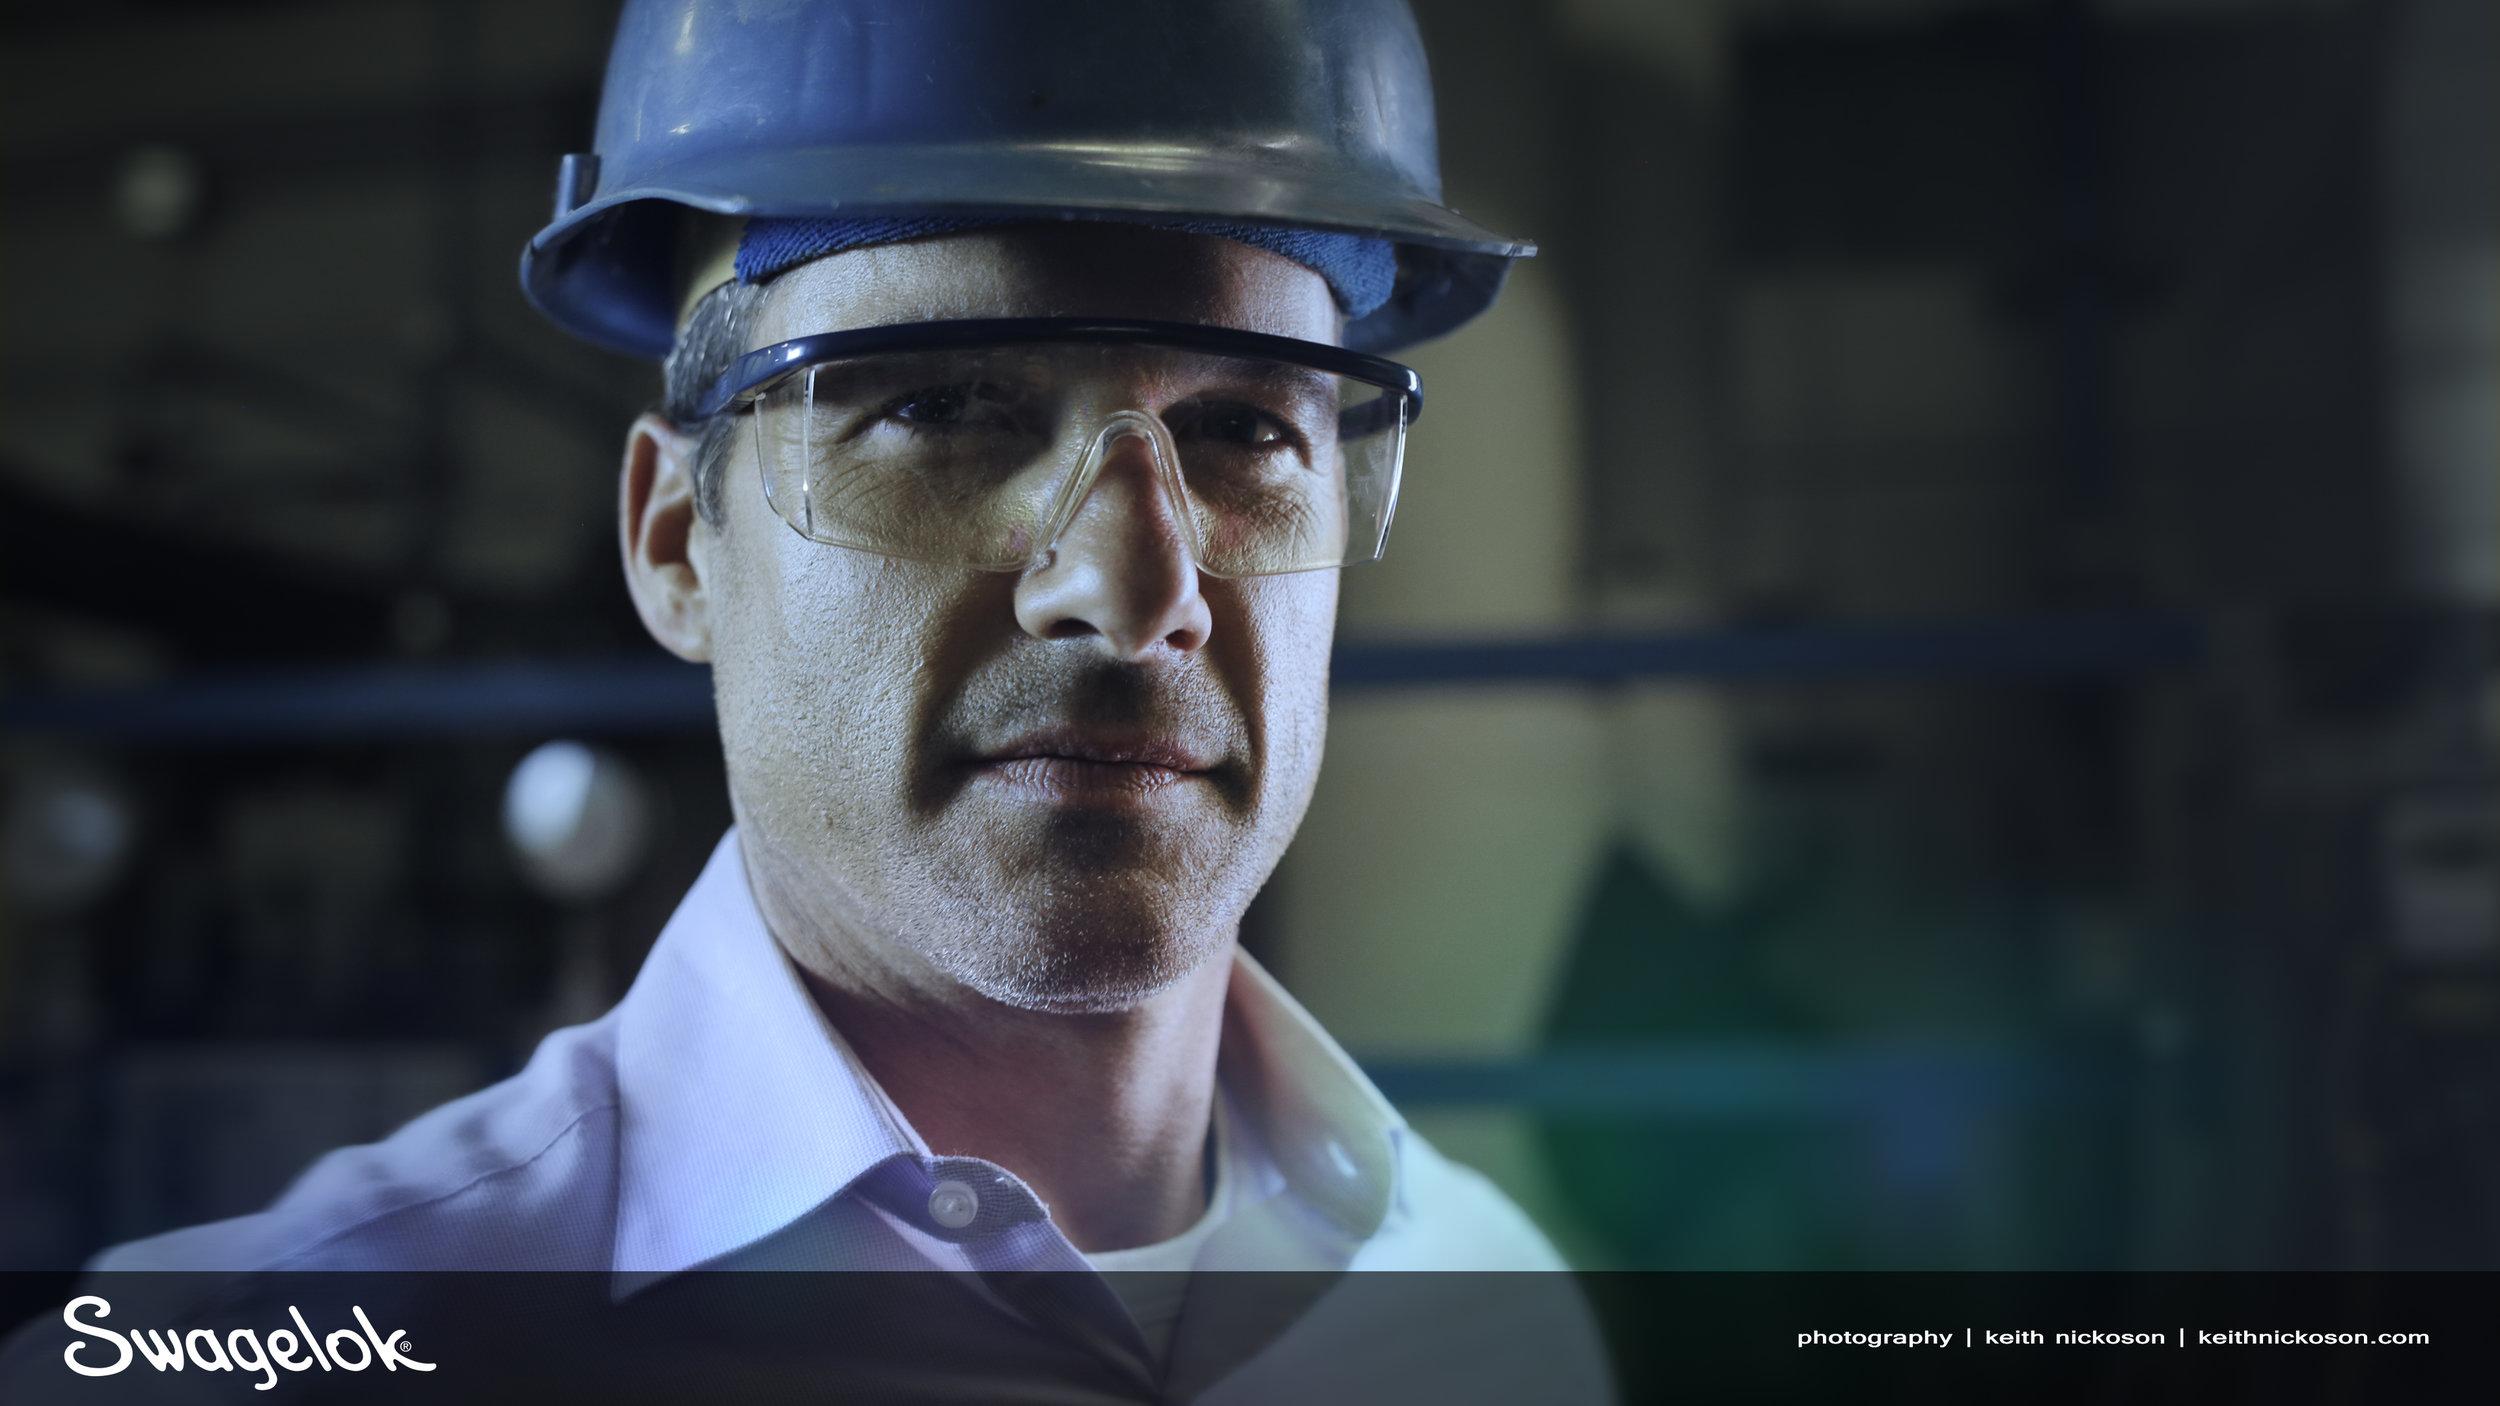 Swagelok Worker 8 - Keith Nickoson.jpg